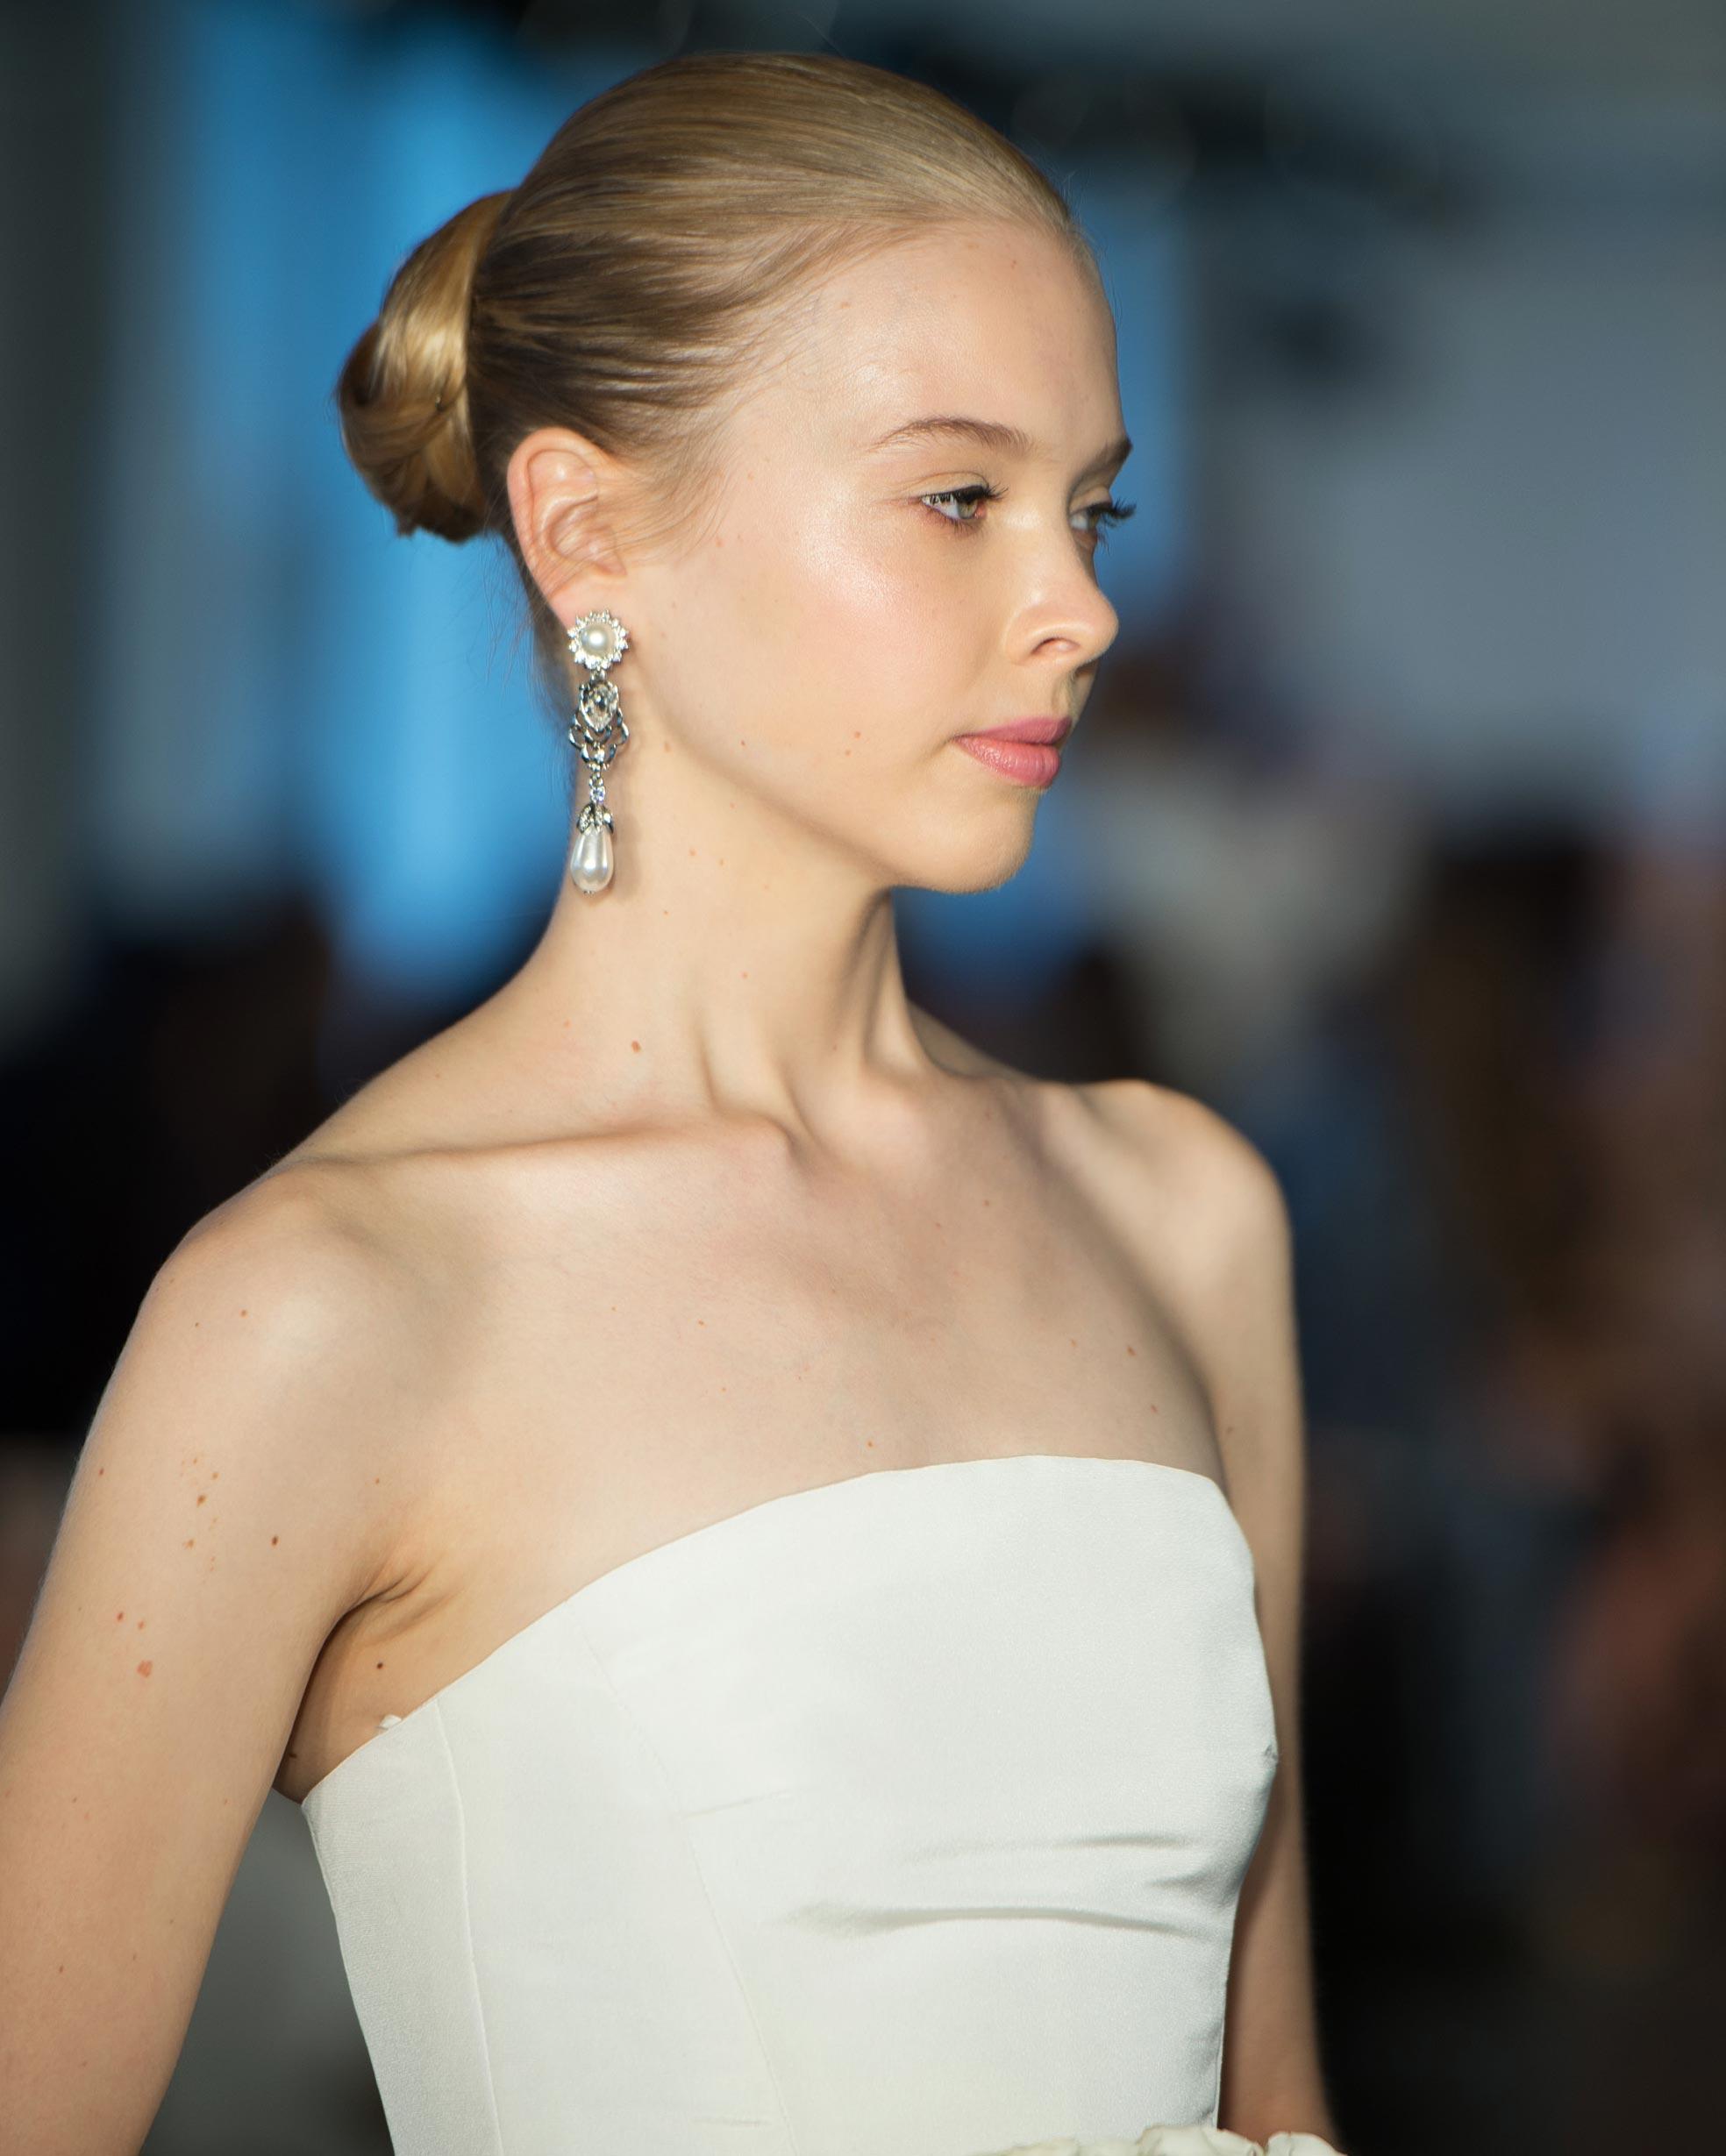 bridal-fashion-hairstyles-oscar-de-la-renta-spring-2017-front-0416.jpg